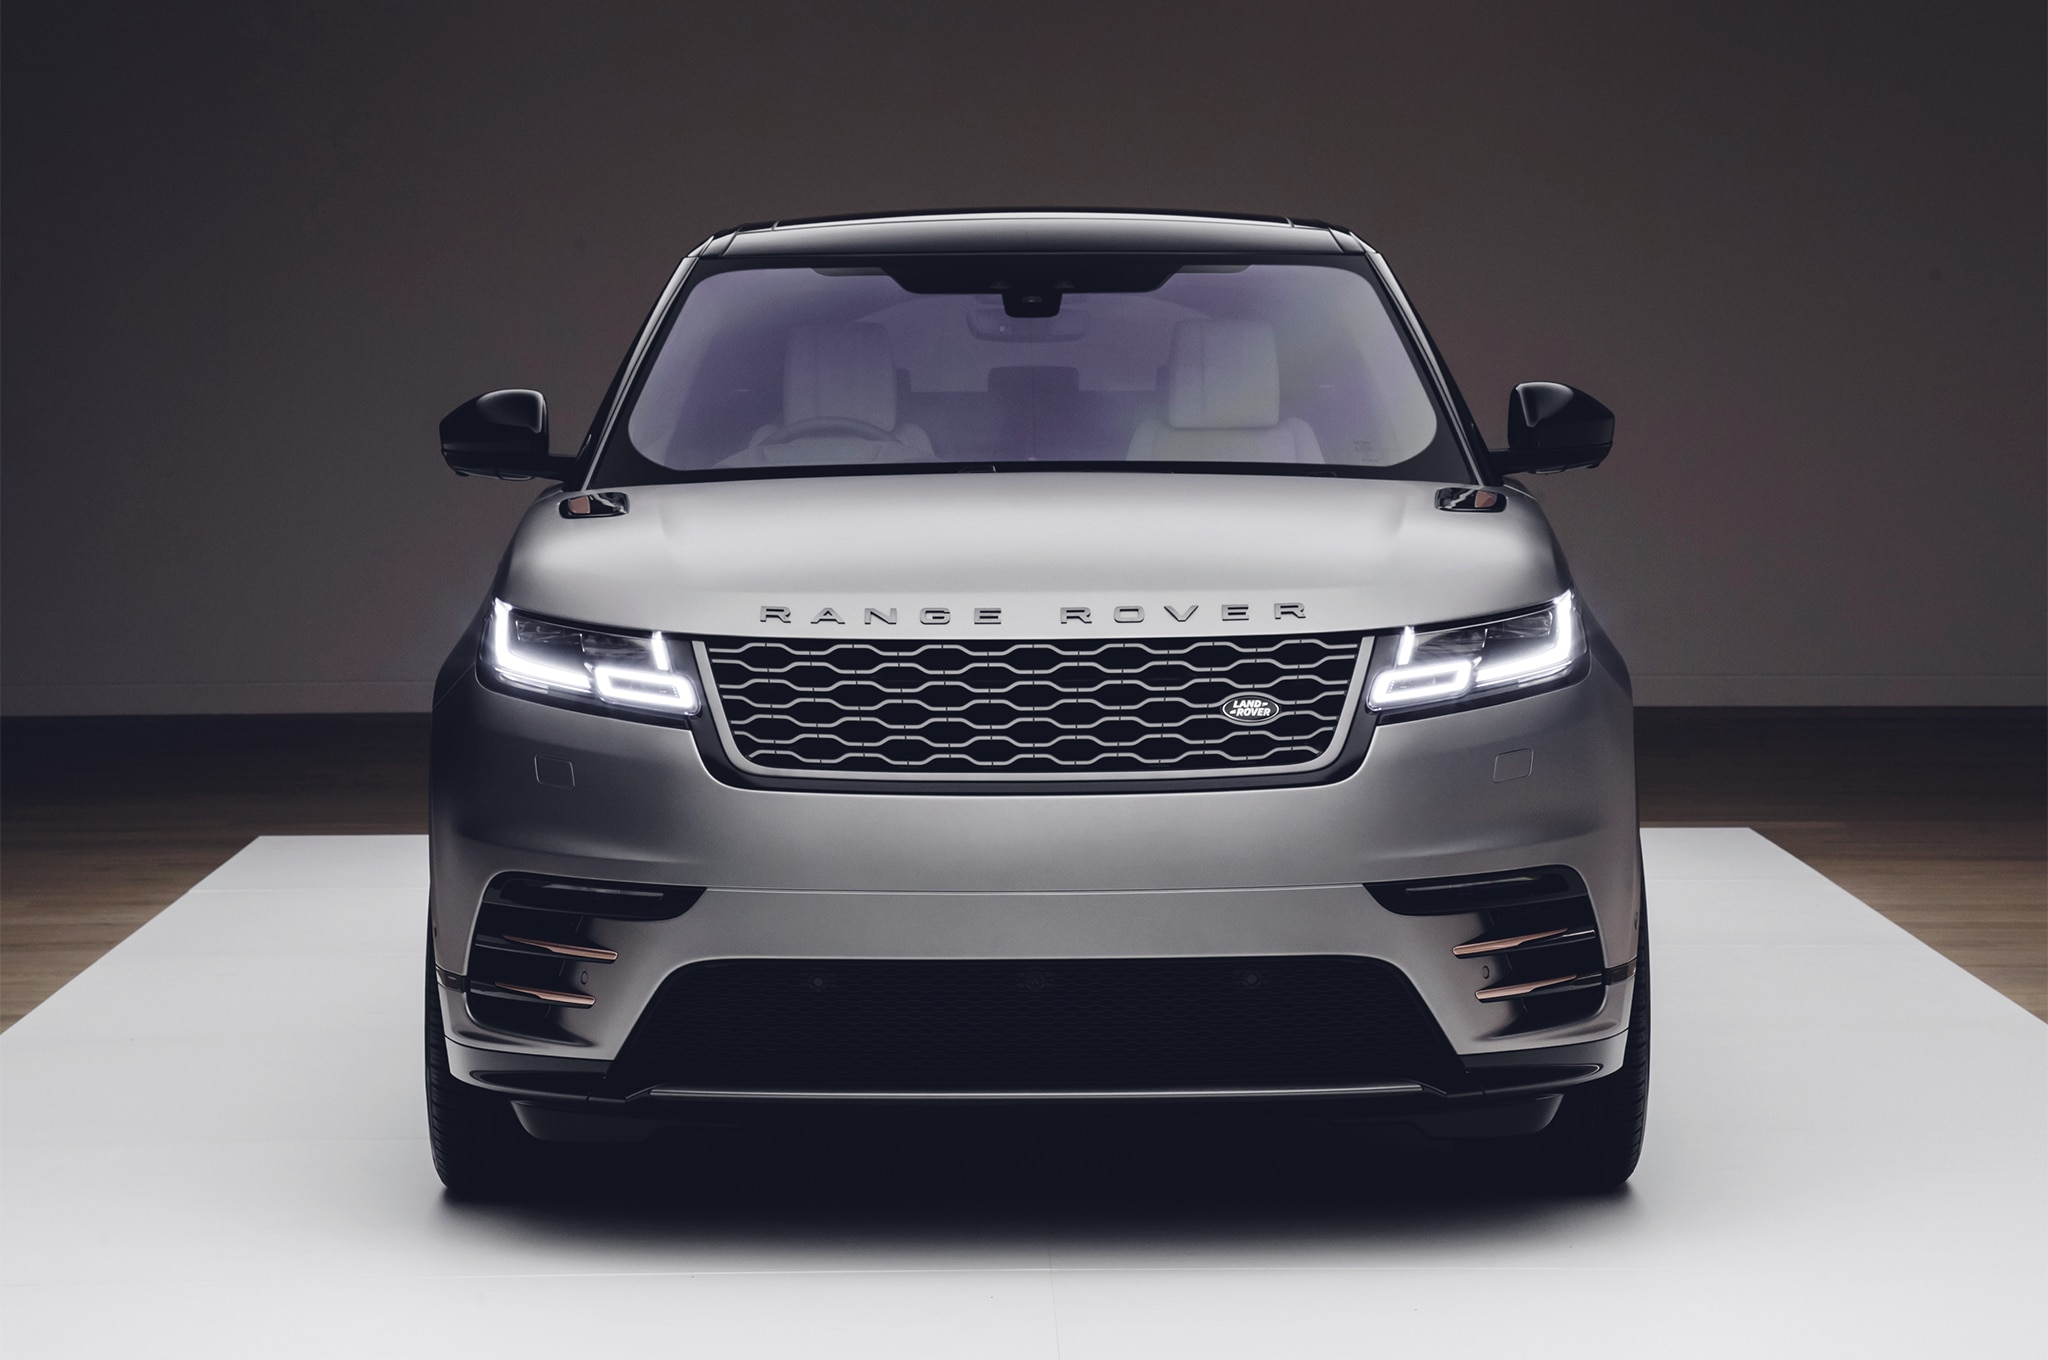 2018 Land Rover Range Rover Velar Front End 1